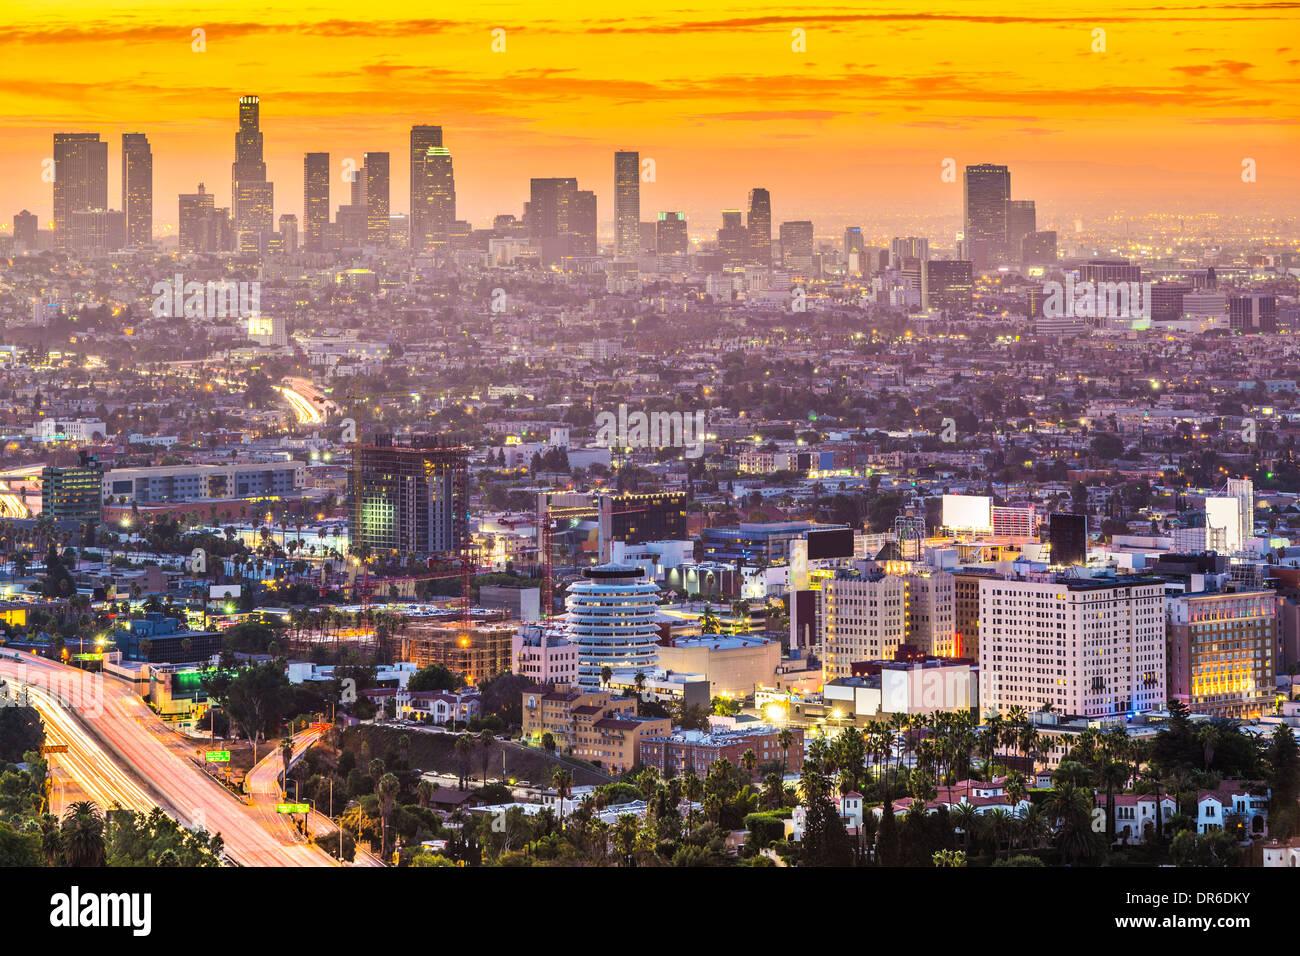 Los Angeles, Kalifornien, USA am frühen Morgen Innenstadt Stadtbild. Stockbild